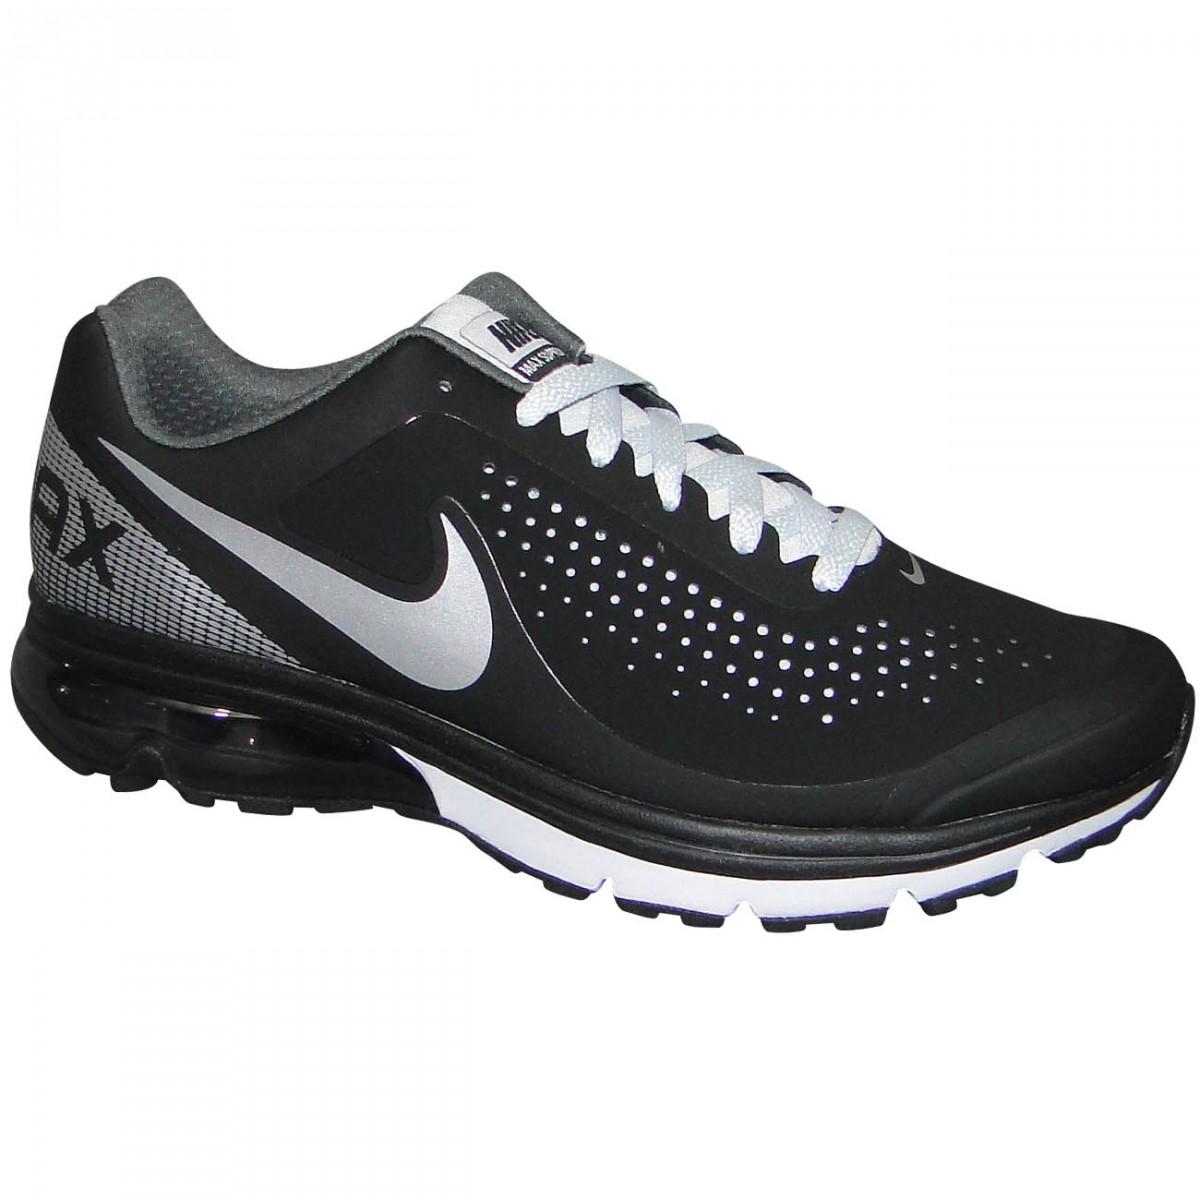 ded86b9f03480 Tenis Nike Air Max Supreme 2 633024 010 - Preto/Prata - Chuteira ...